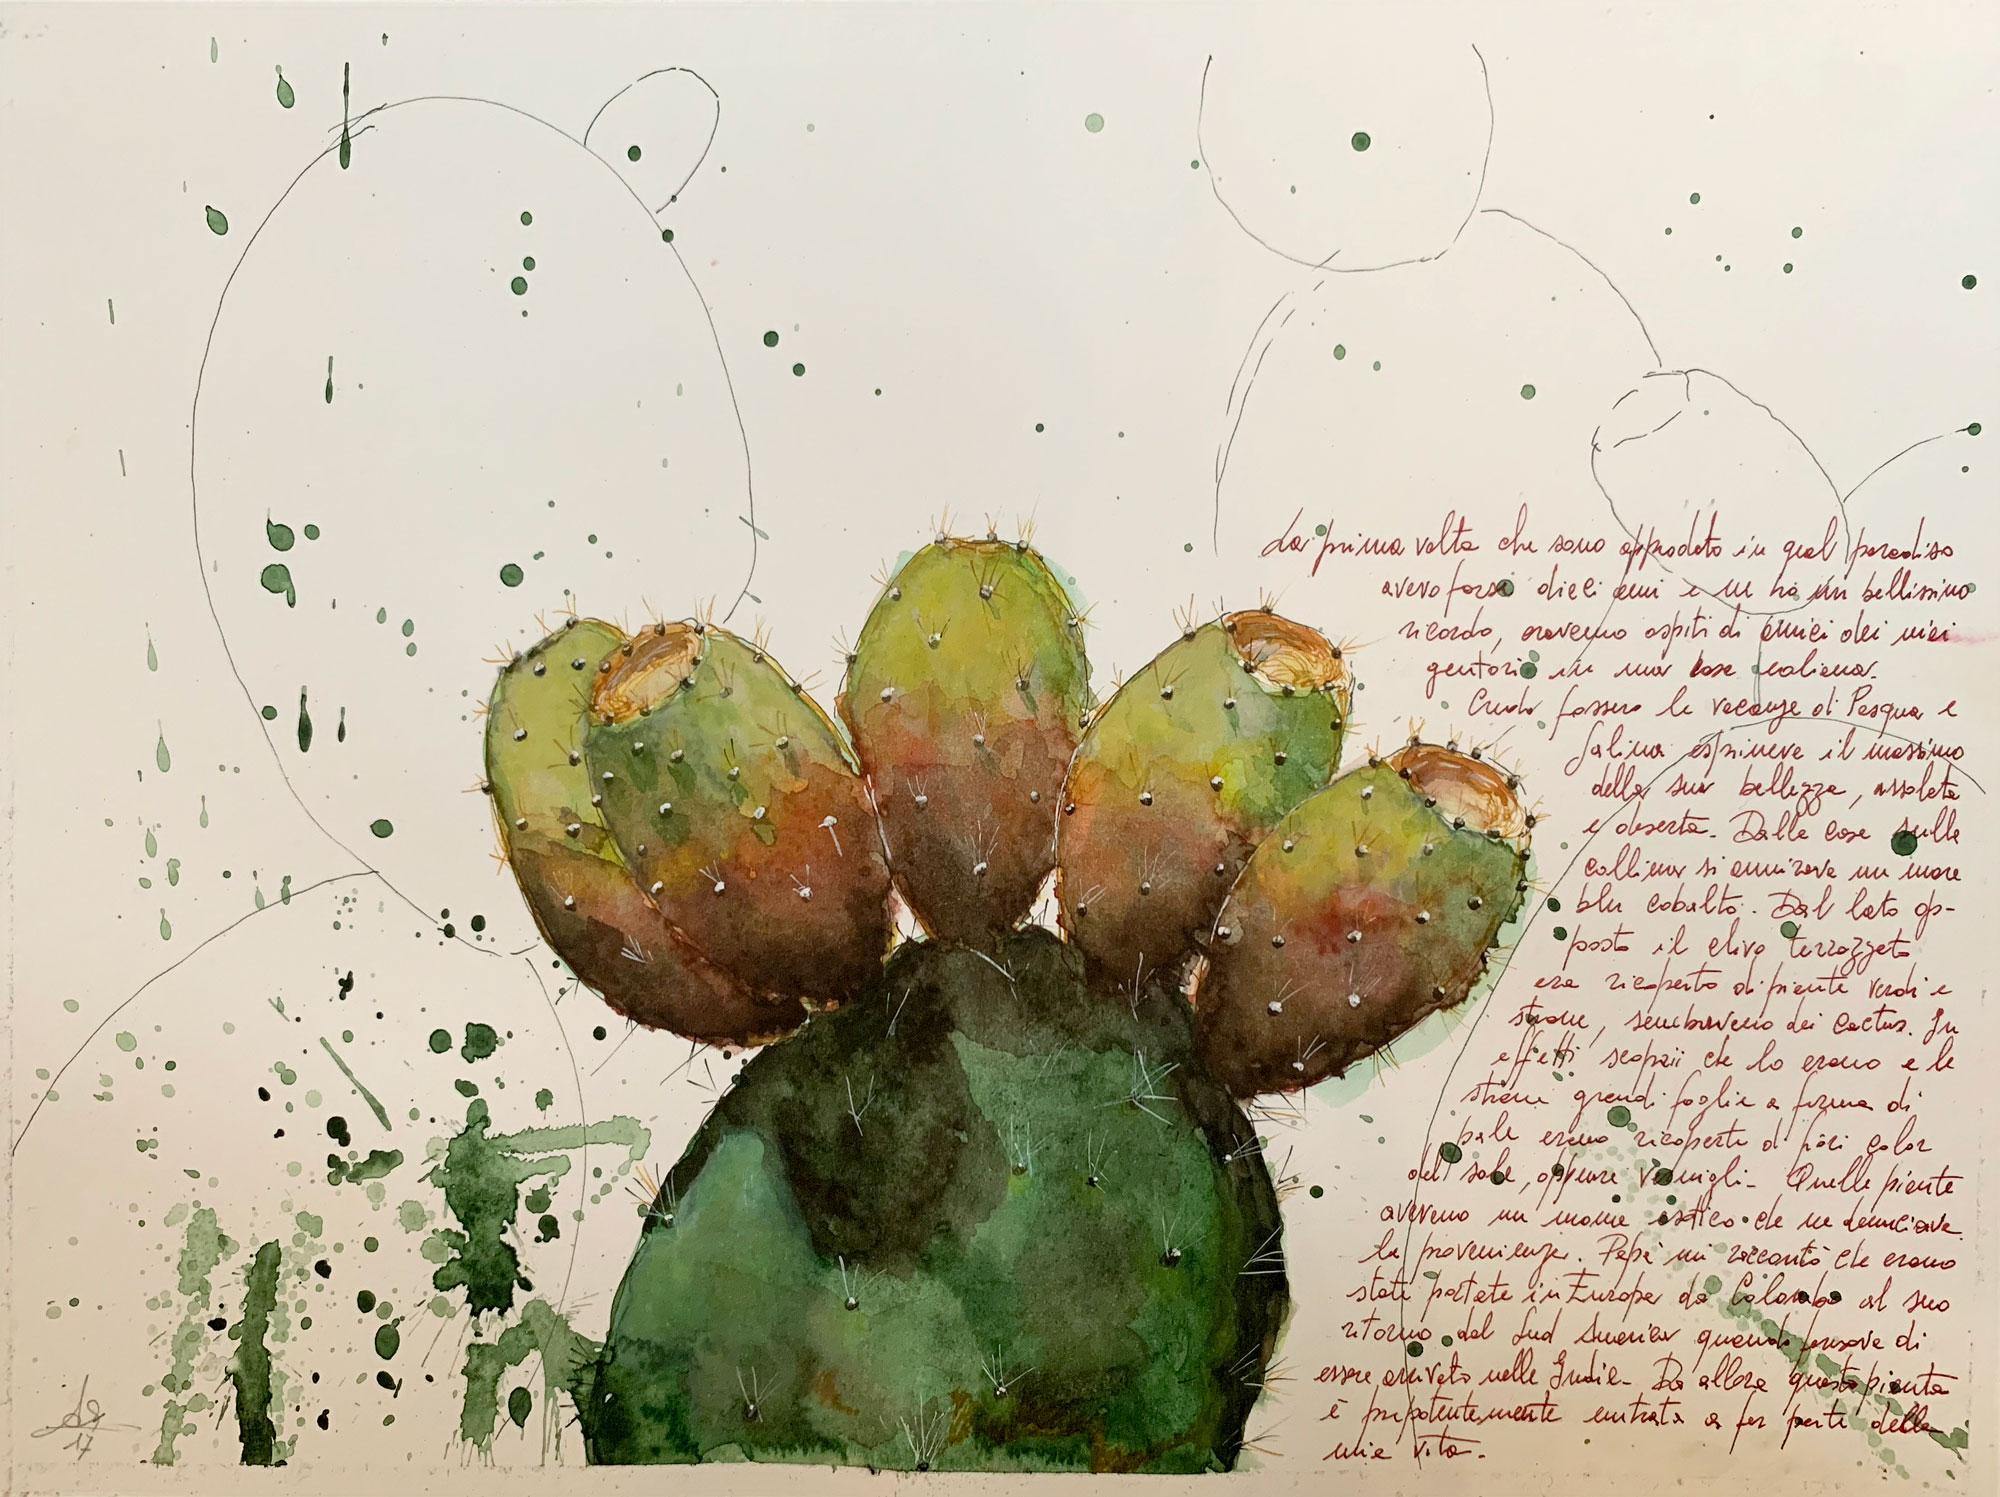 Aurelio Carraffa - I miei disegni